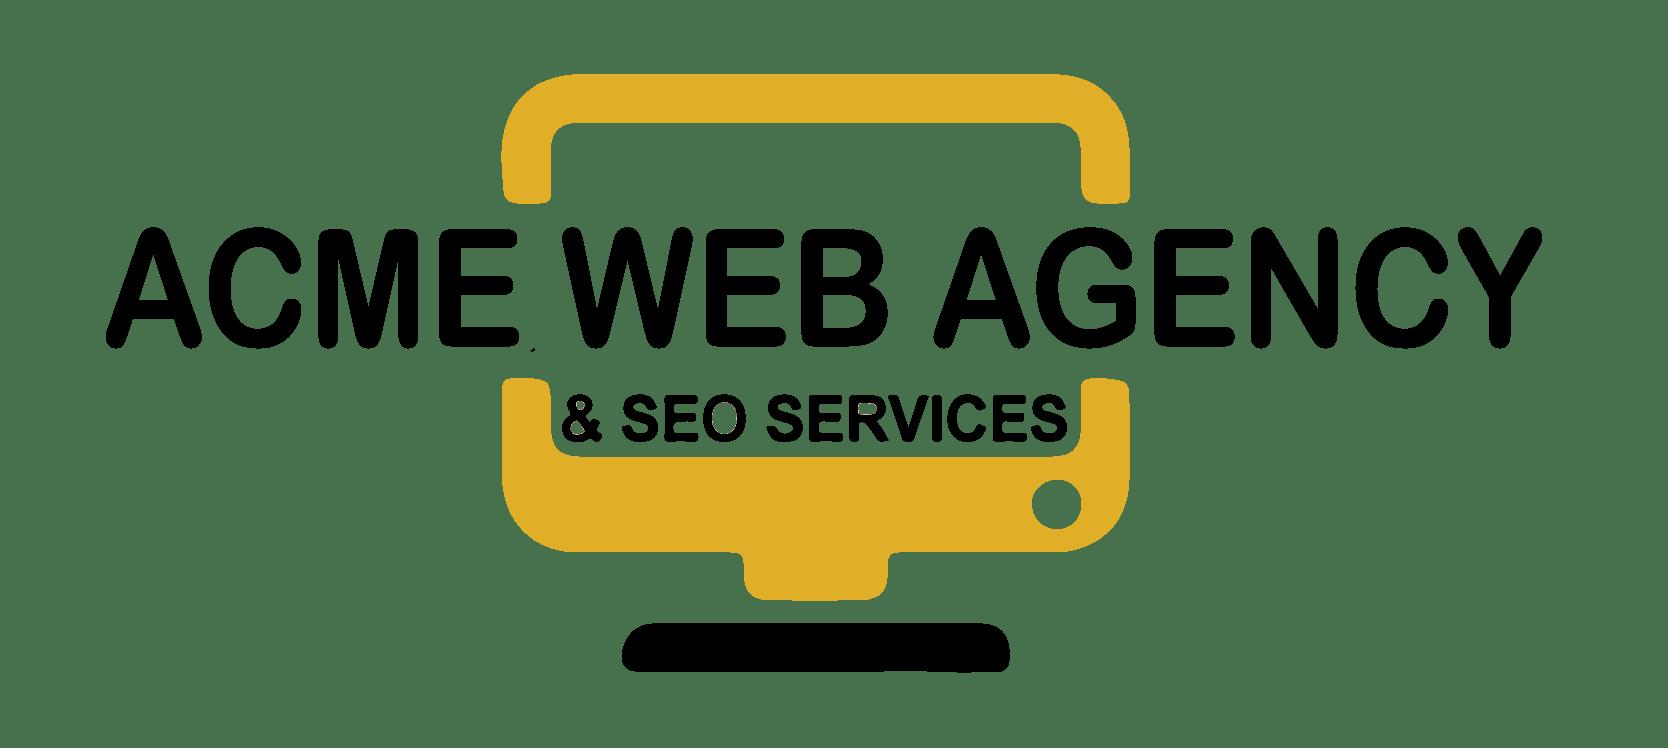 Minneapolis SEO Company, Minneapolis SEO For Small Business 2019, Acme Web Agency